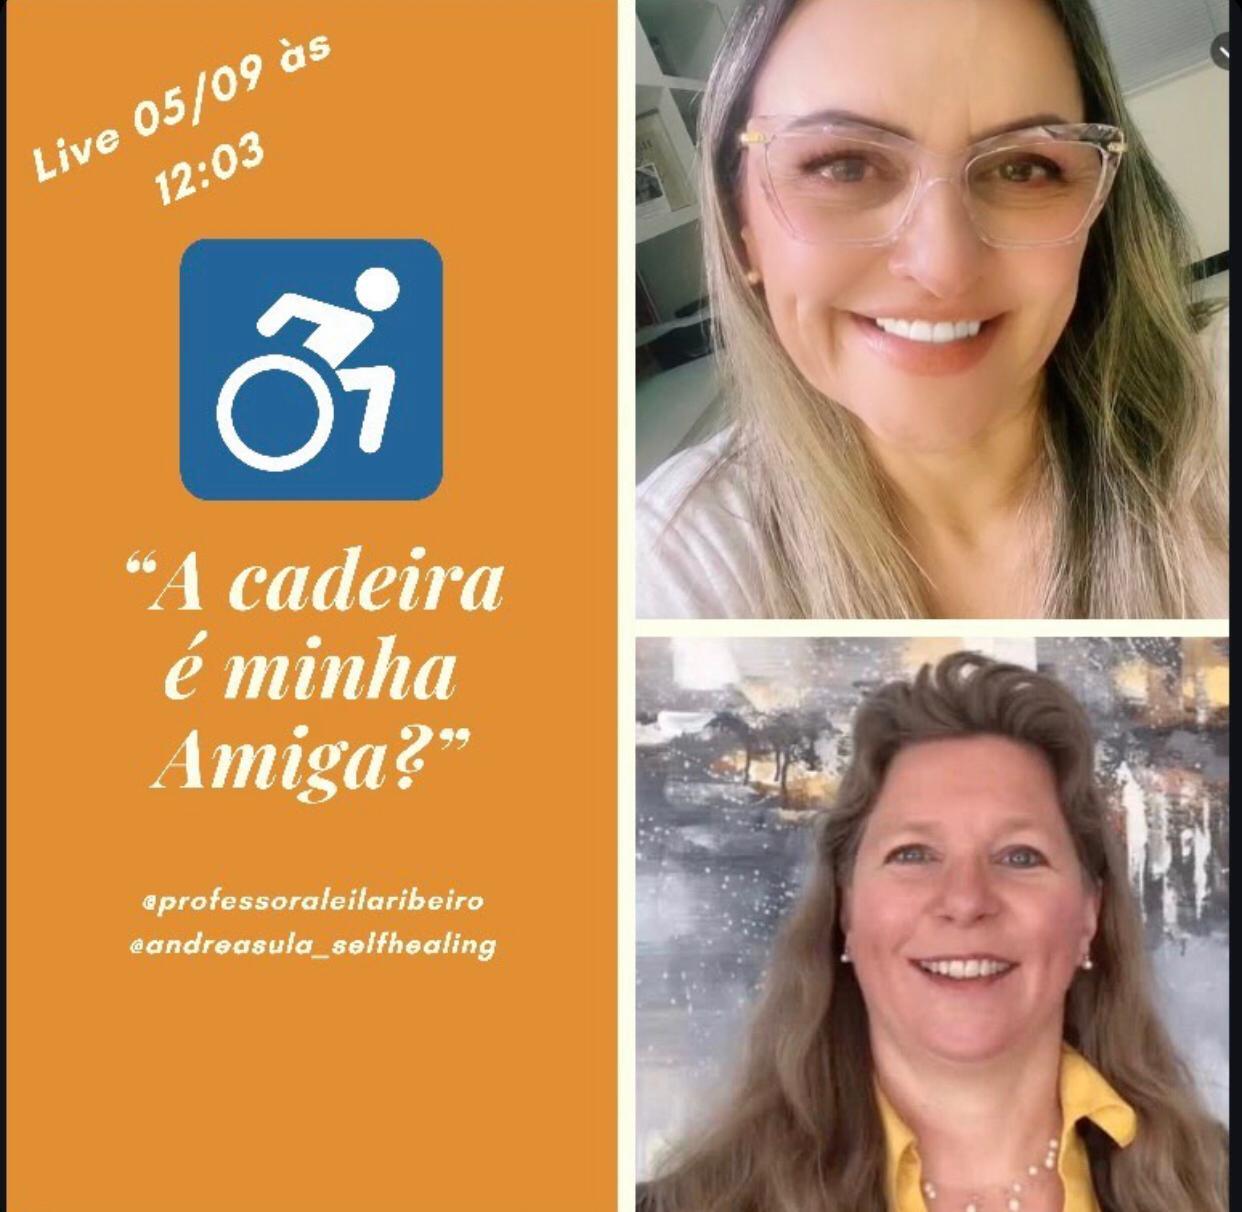 LIVE Canal da Leila